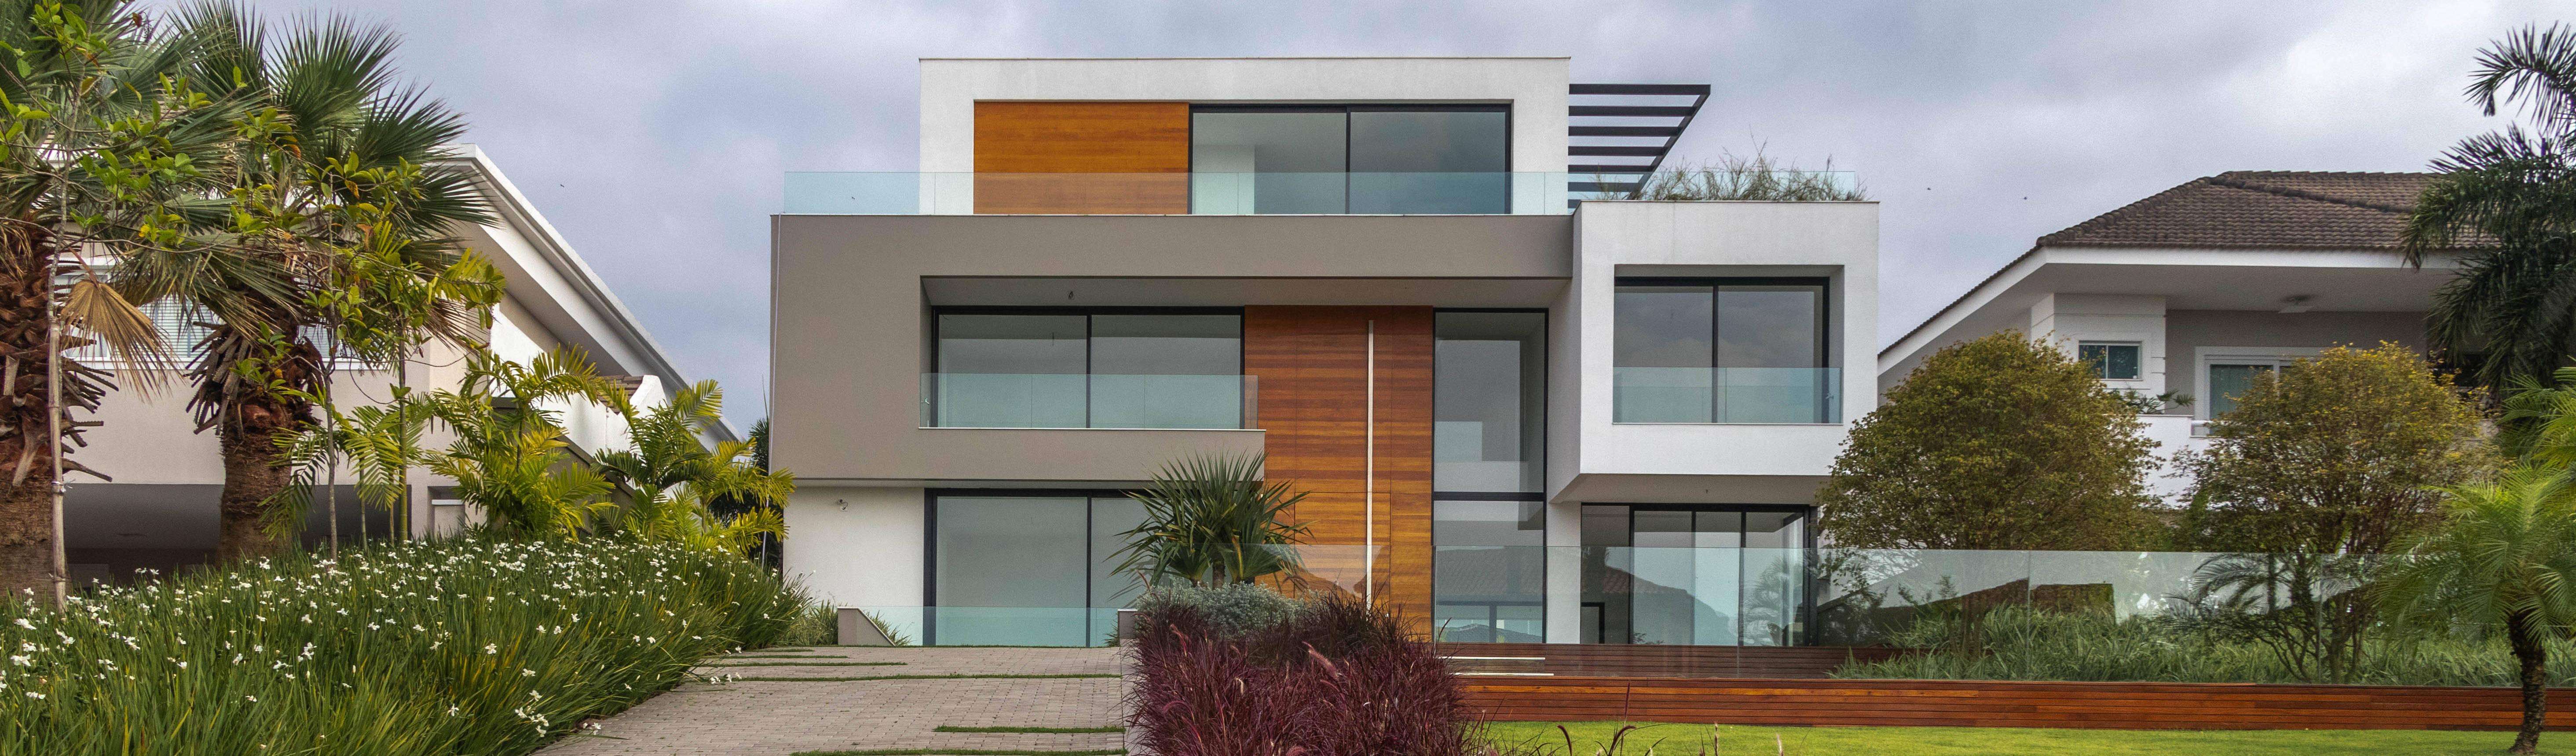 Debiaze Arquitetura